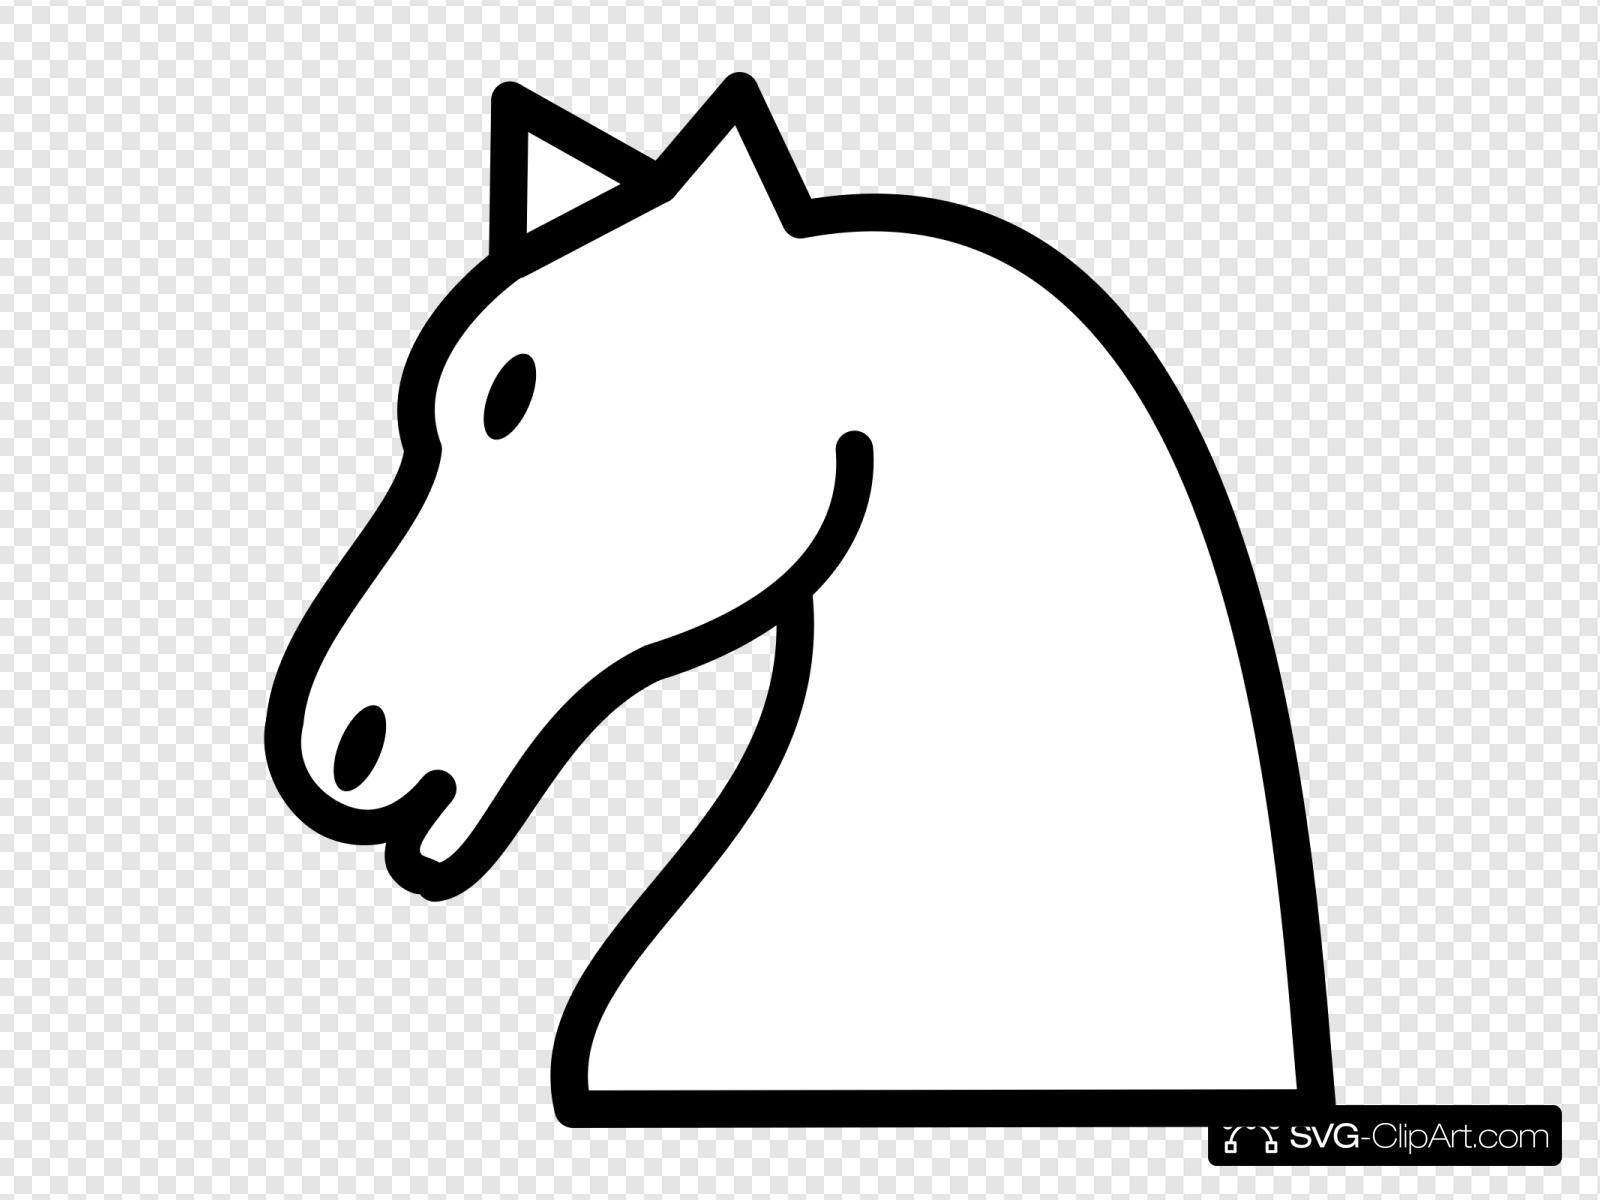 White Knight Clip art, Icon and SVG.